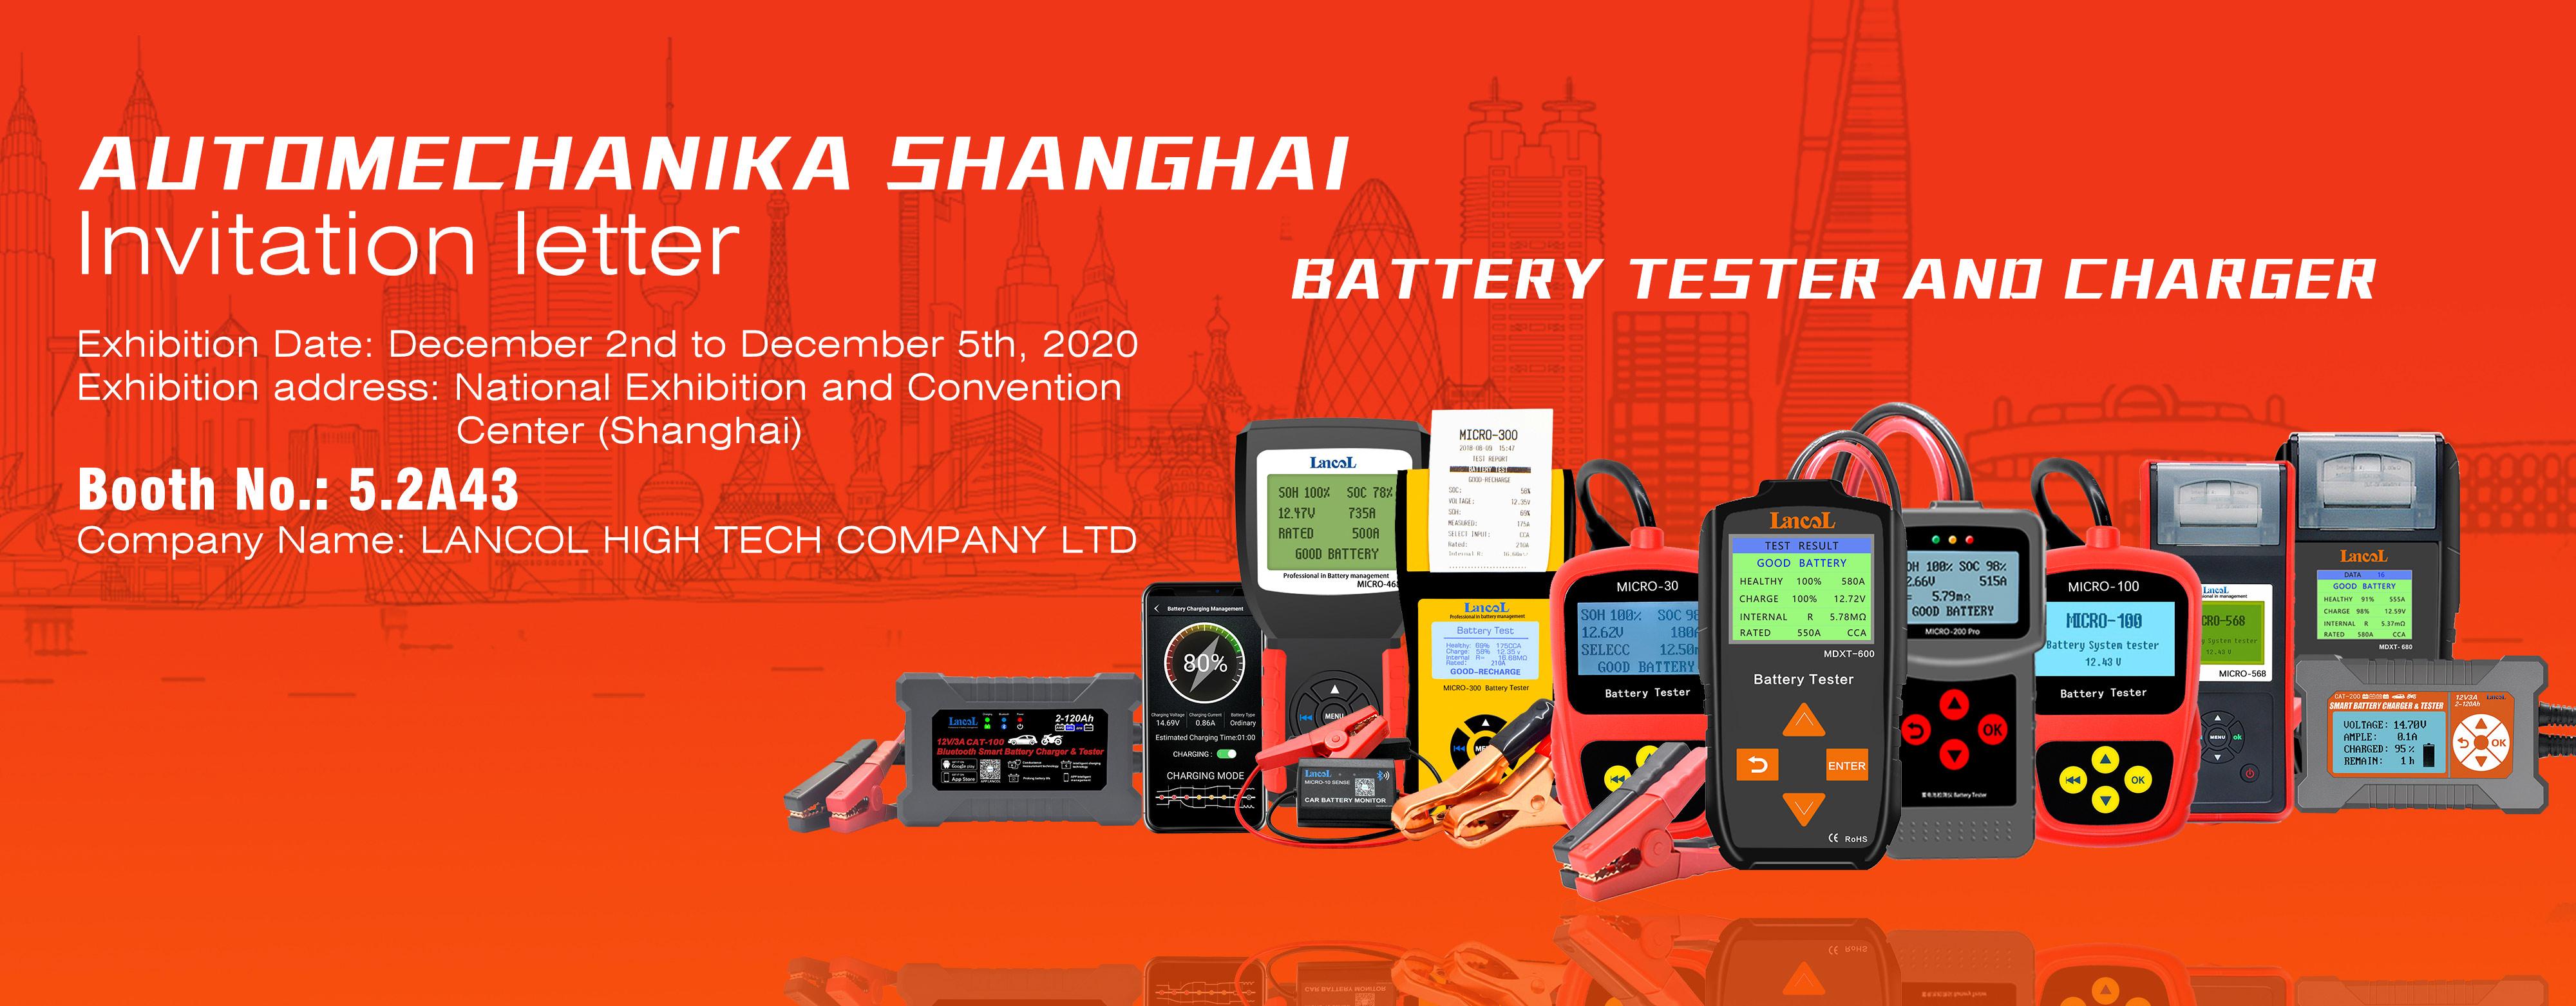 2020 automechanika shanghai invitation